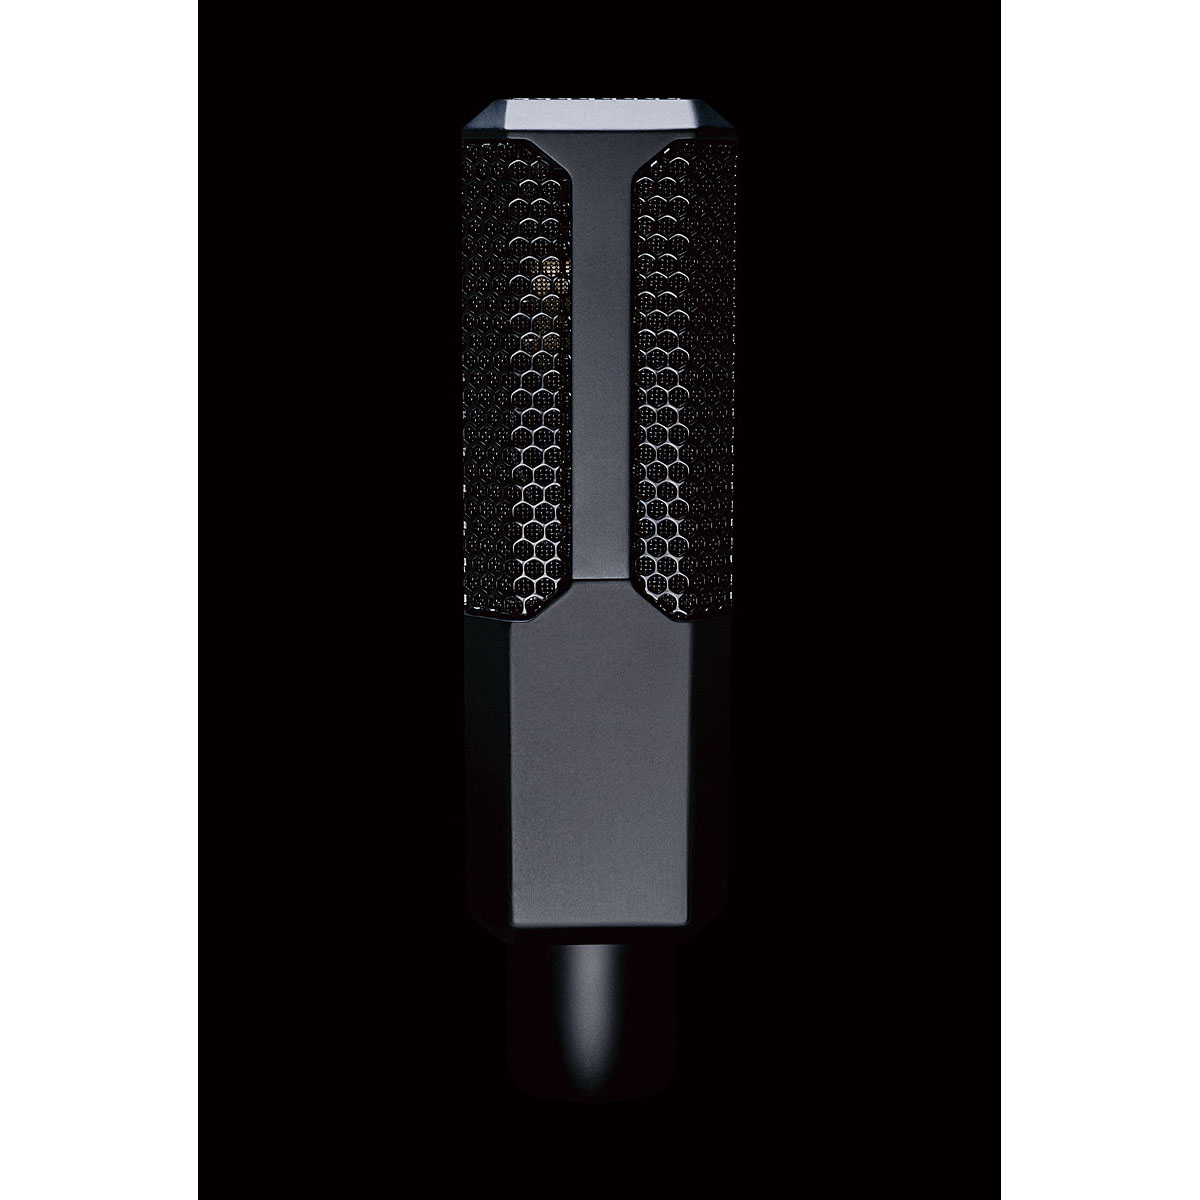 Lewitt LCT 240 kondensatormikrofon